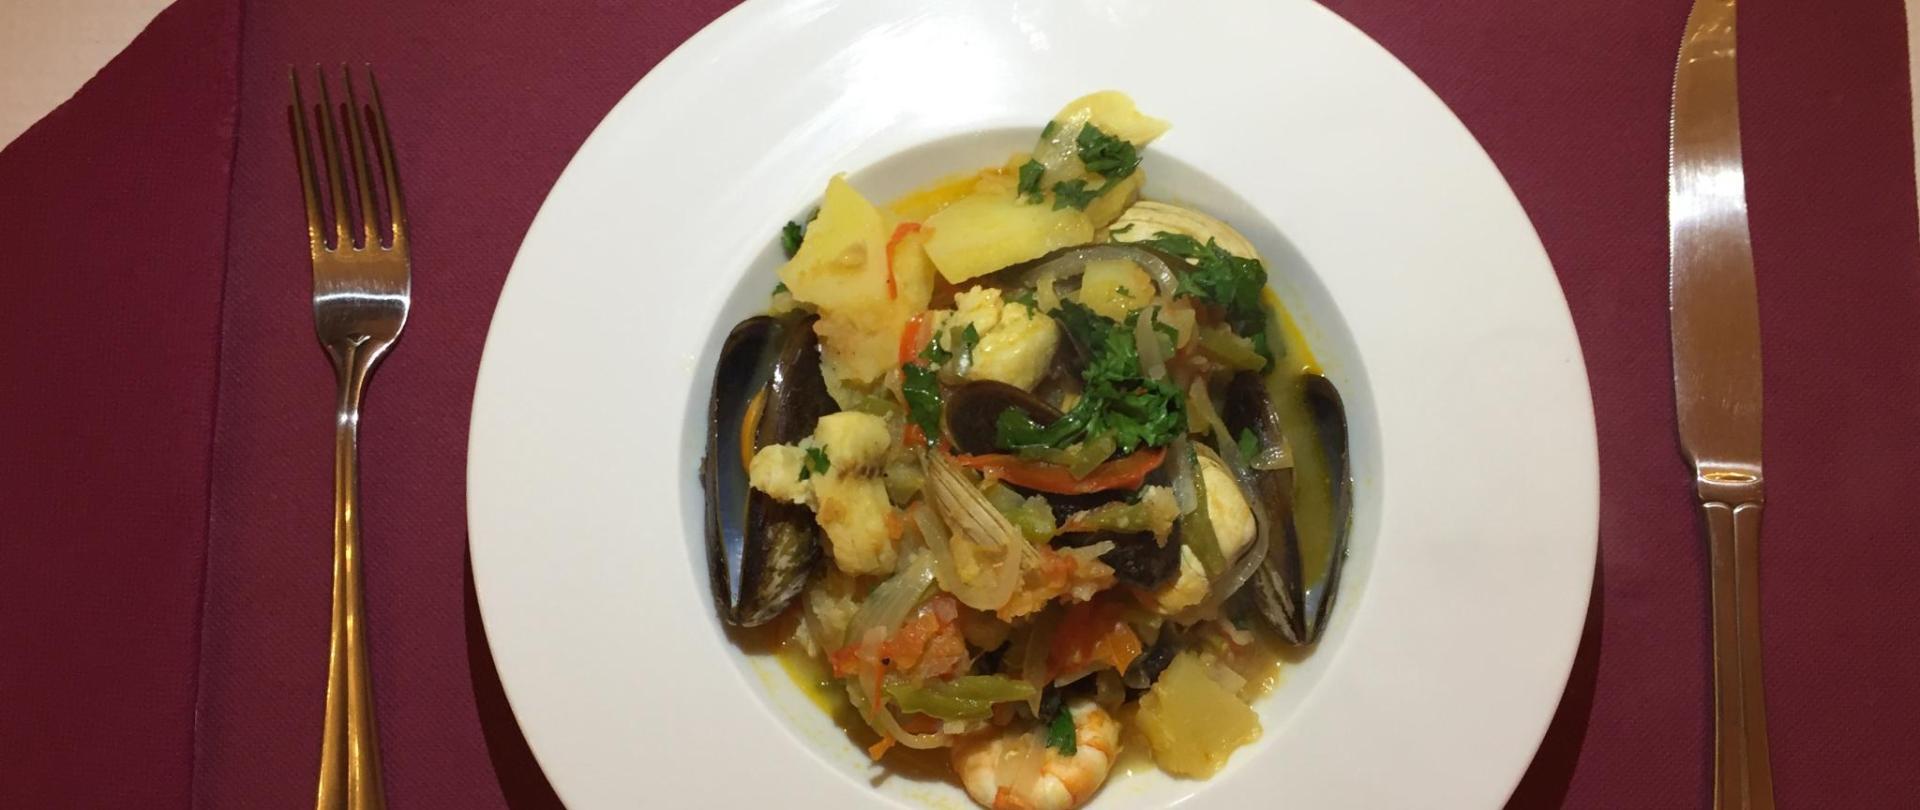 Portuguese Fish Stew.jpg